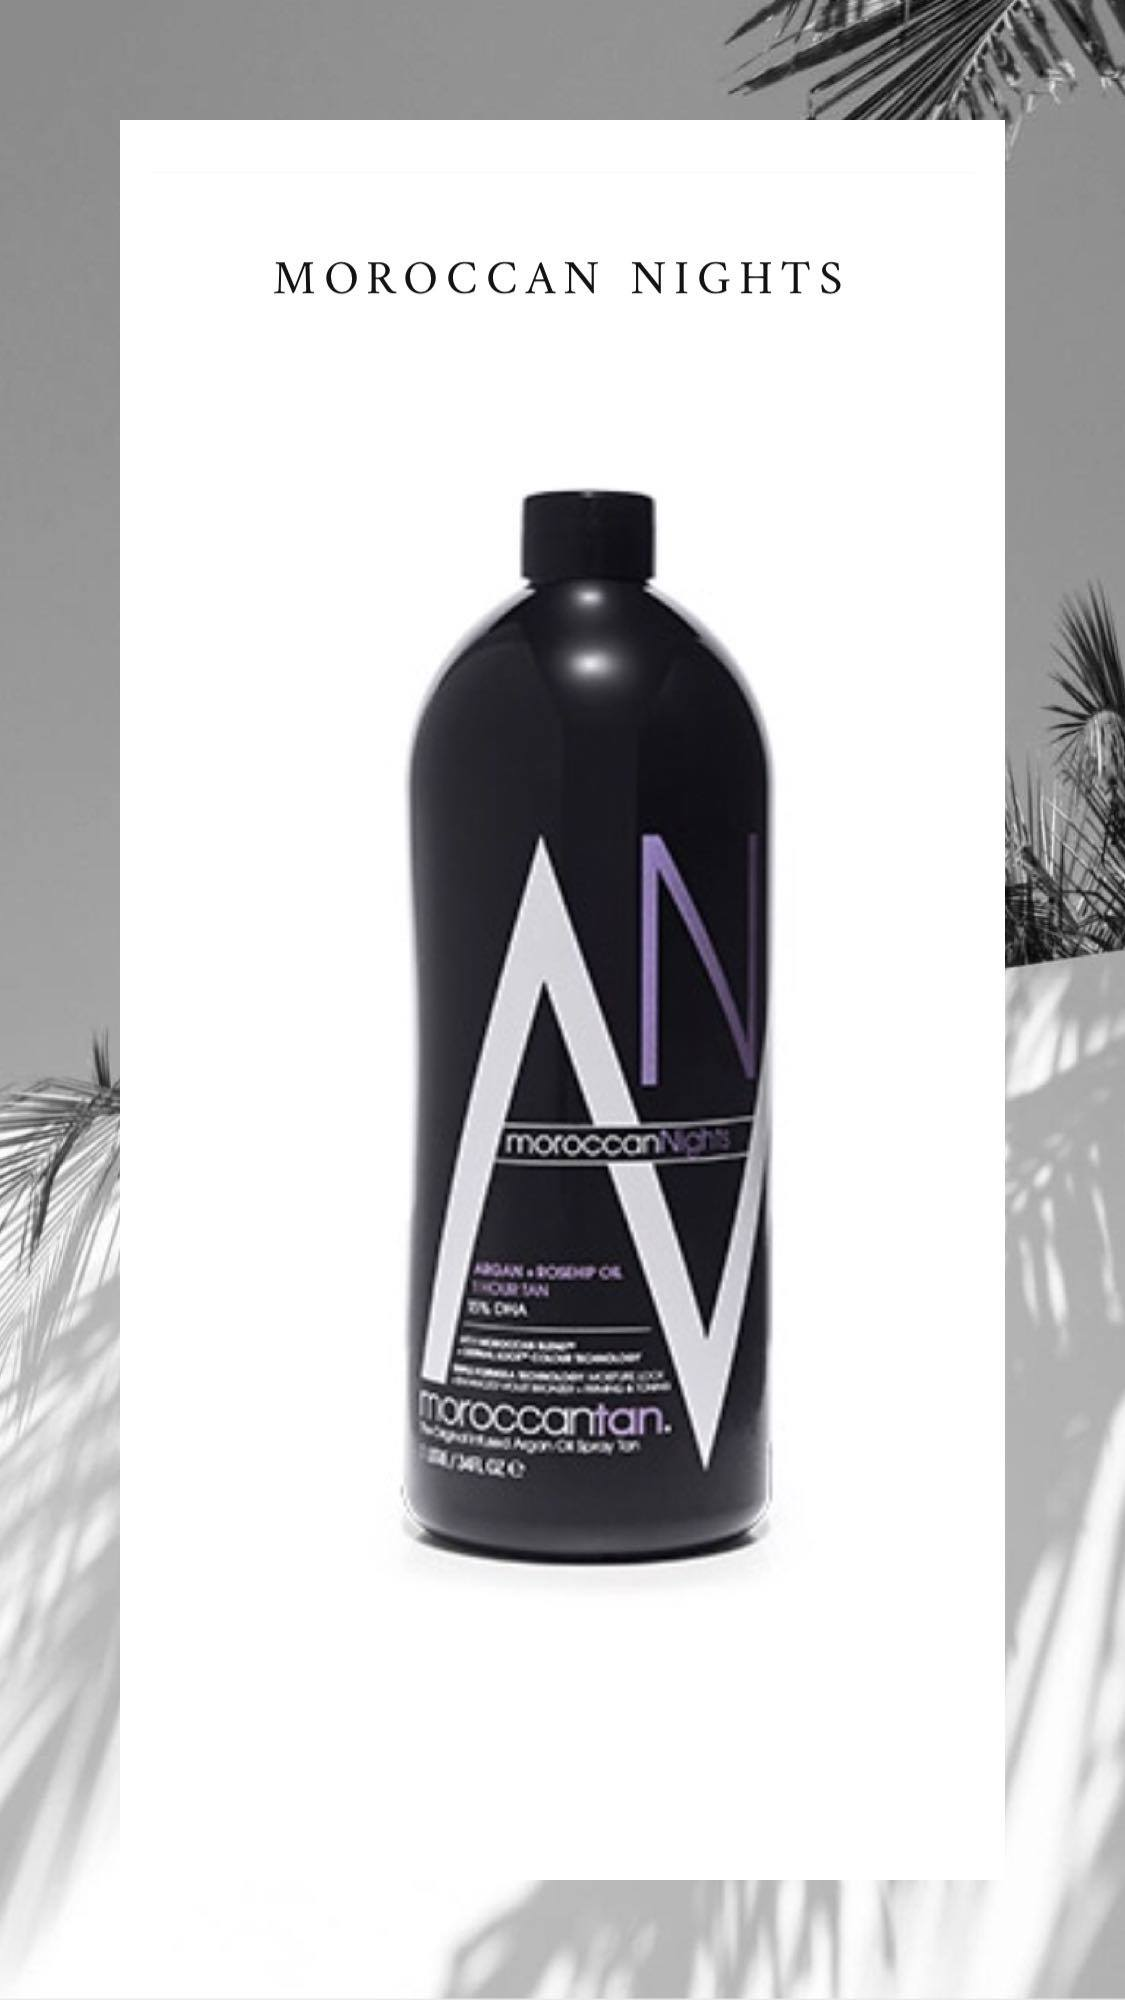 Exotics spray tan væsker fra MoroccanTan